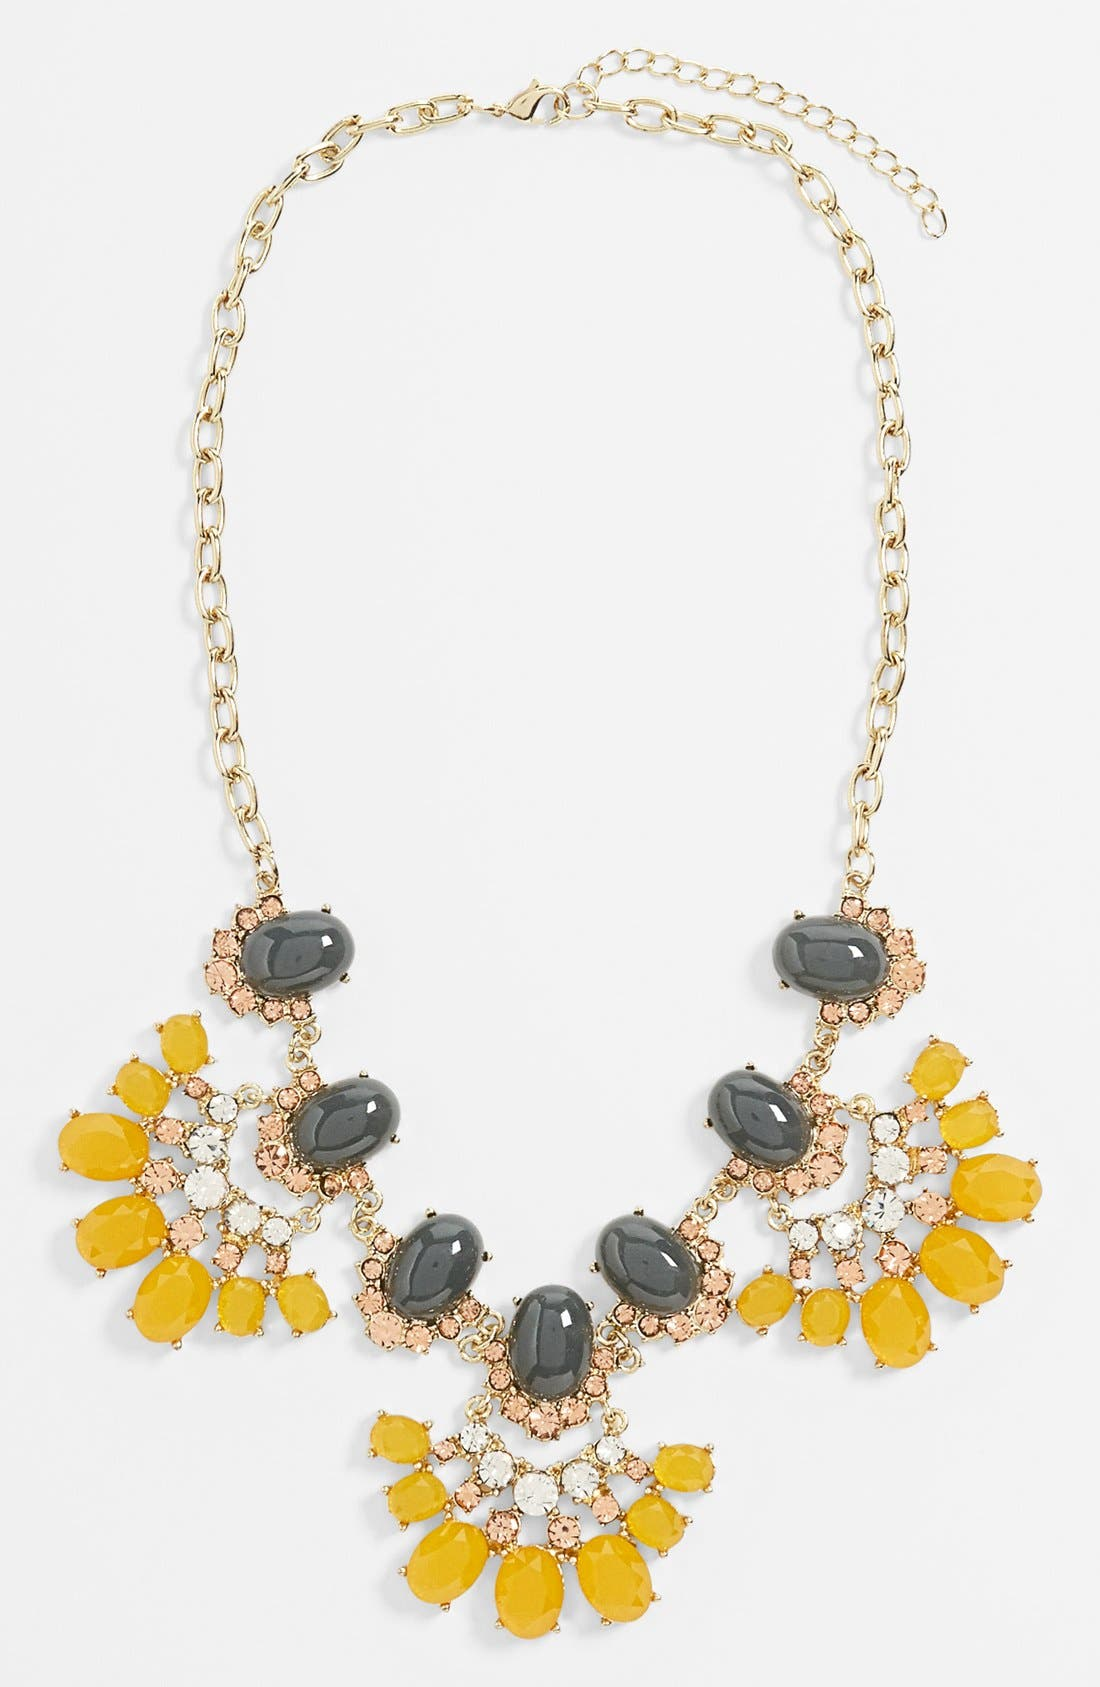 Main Image - Tildon 'Vintage Floral' Statement Necklace